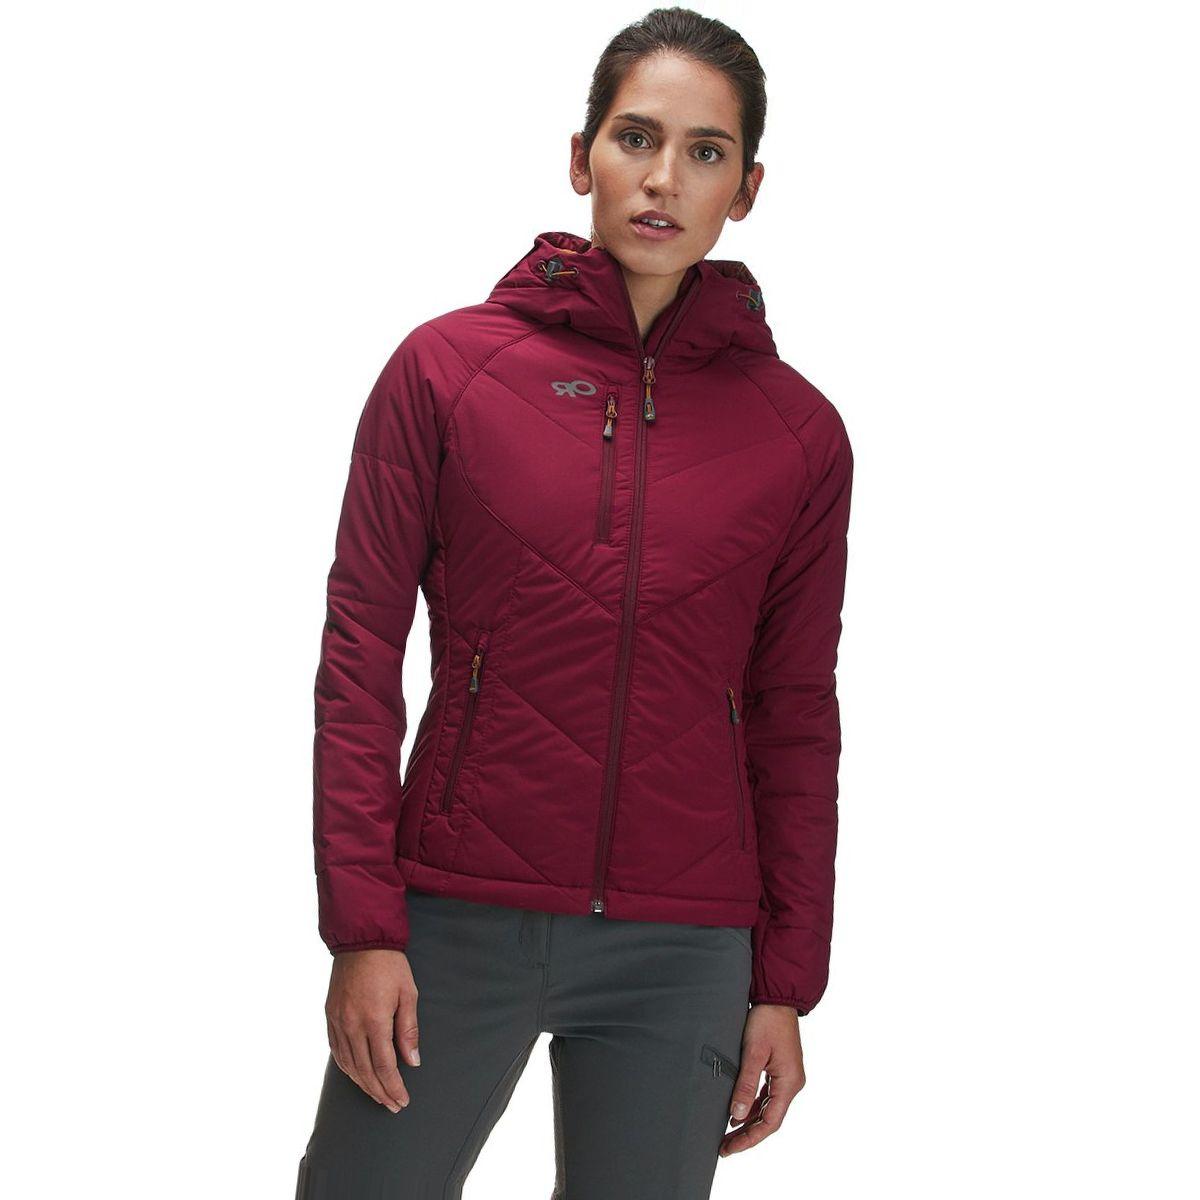 Outdoor Research Refuge Hooded Jacket - Women's